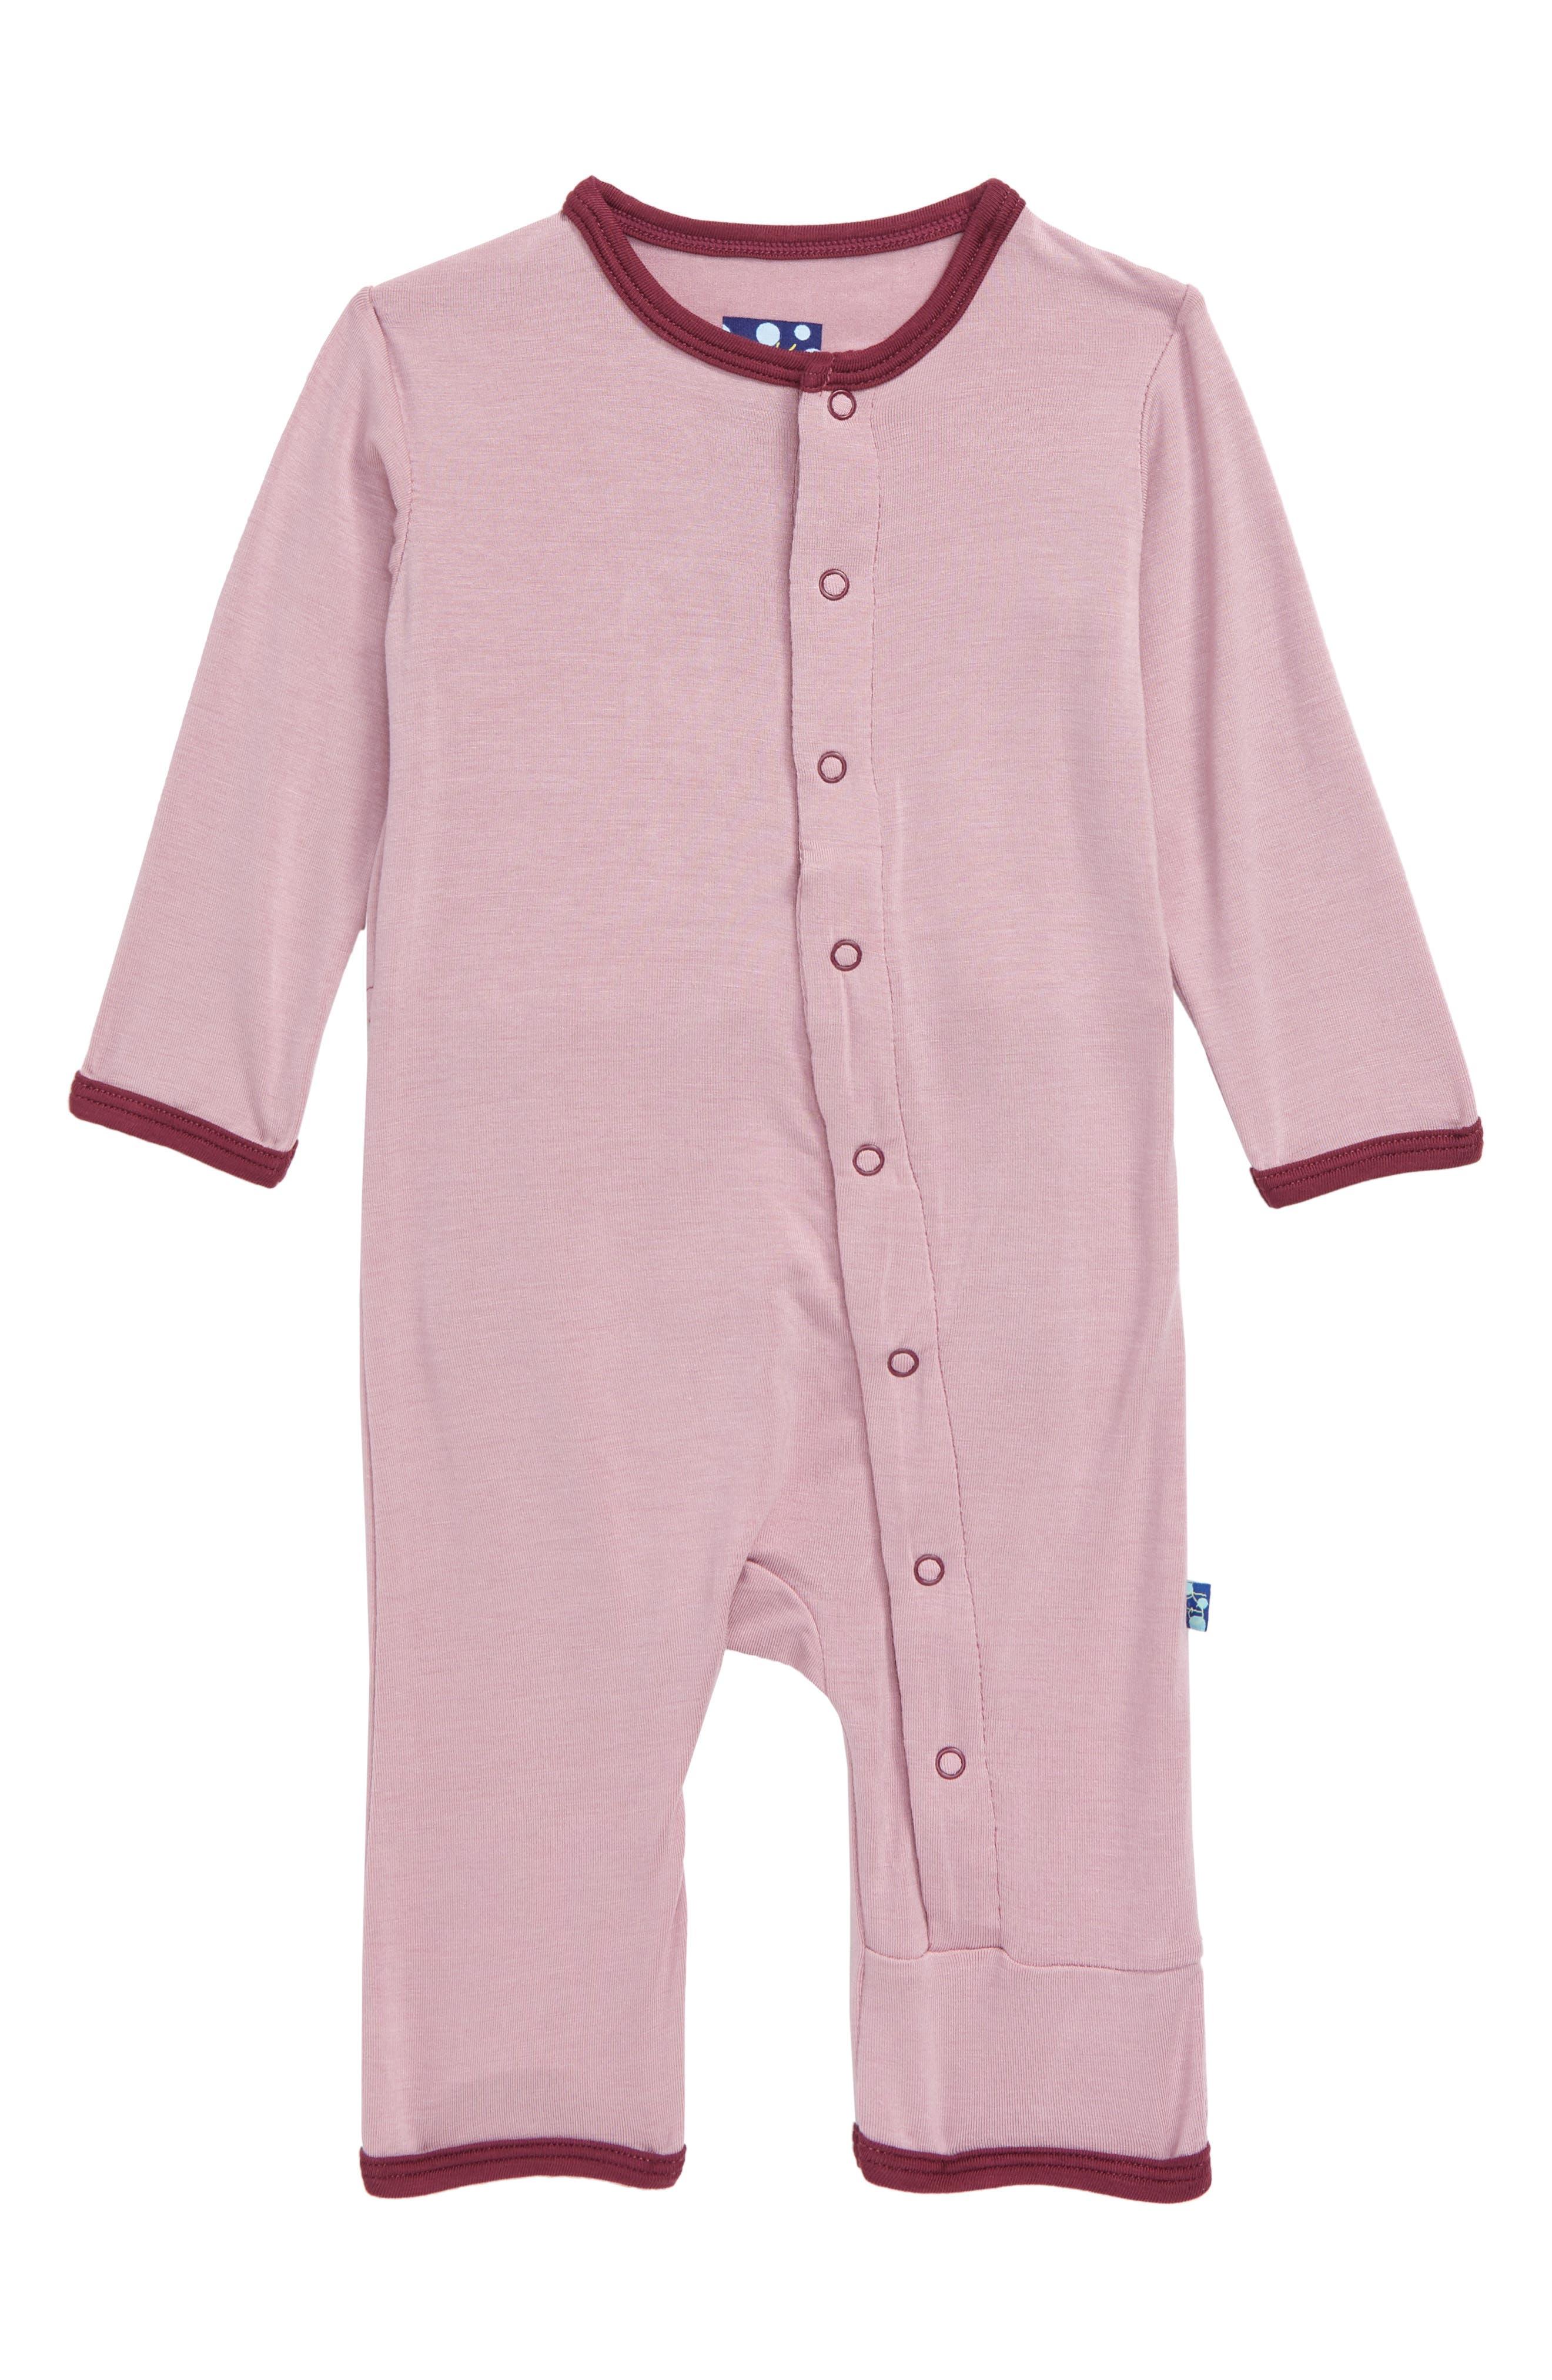 Infant Girls Kickee Pants Dino Applique Romper Size 36M  Pink